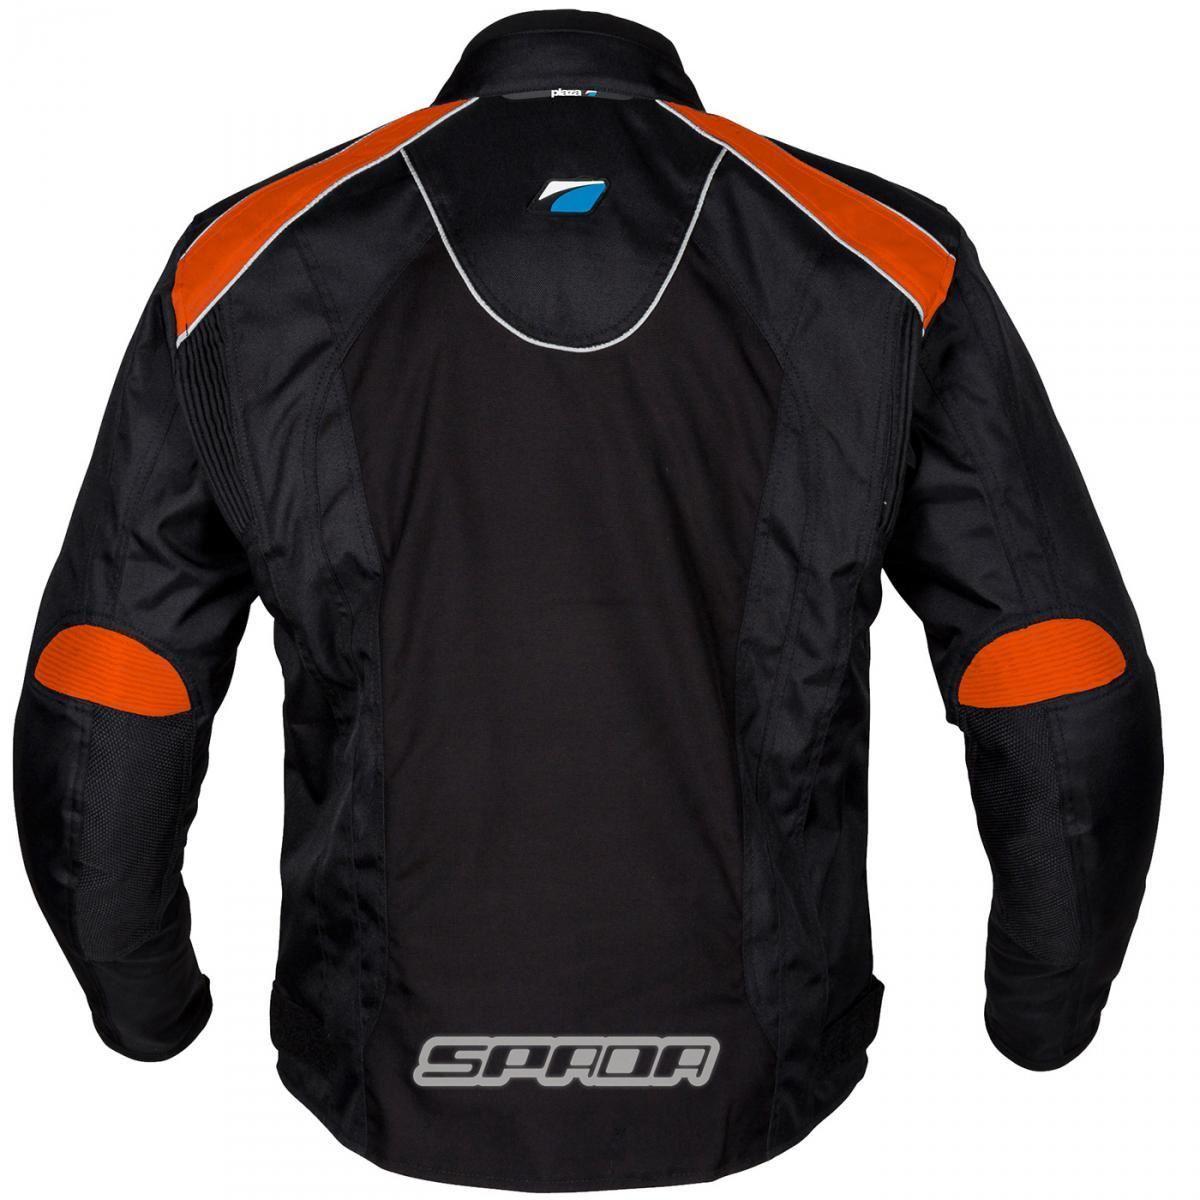 Spada-Plaza-Motorcycle-Jacket-Black-KTM-Orange-Waterproof-Thermal-M-2XL thumbnail 16